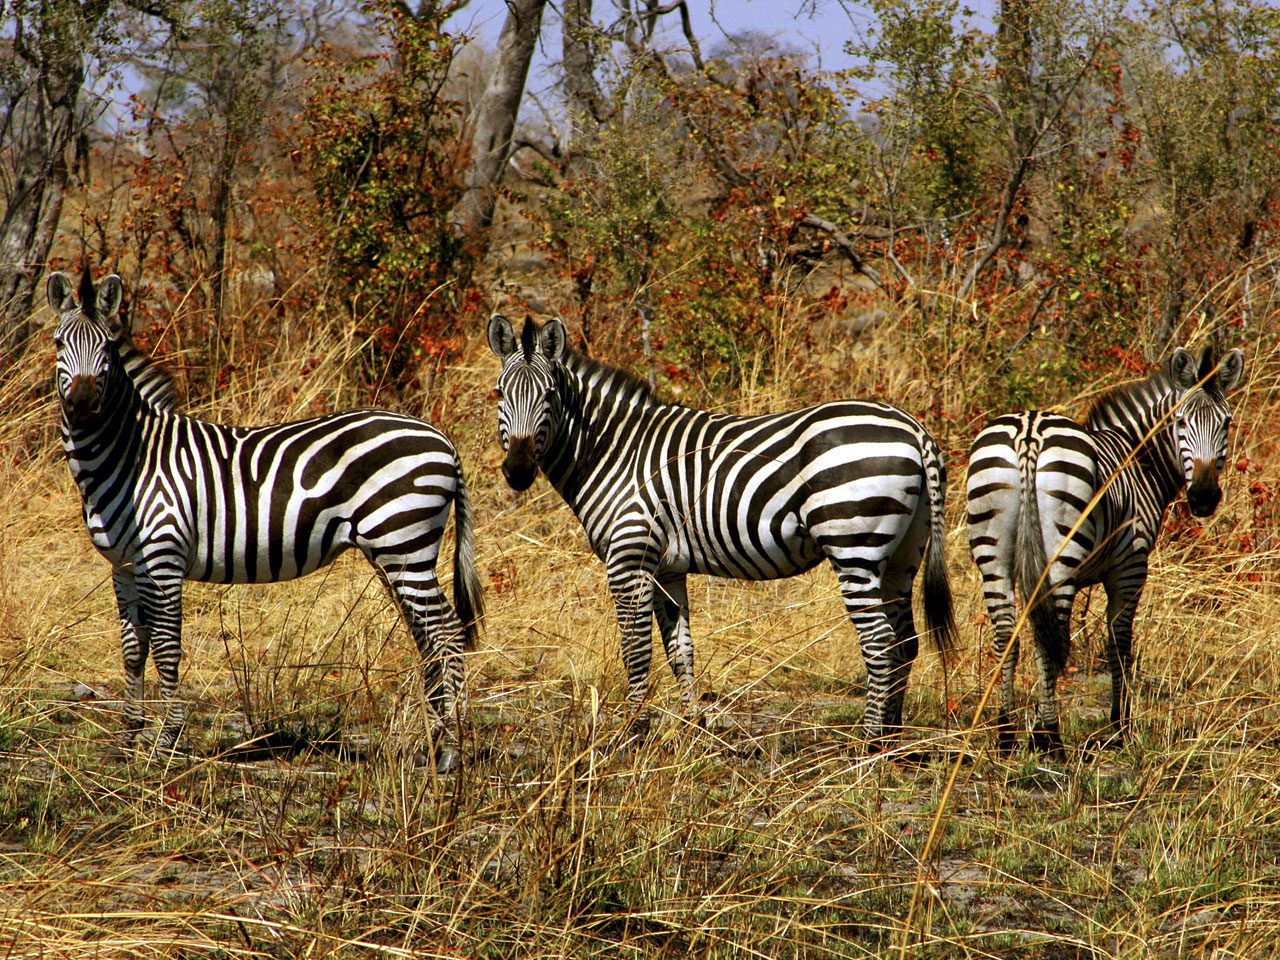 http://4.bp.blogspot.com/-rFkOnxpXnG8/T9qYwc2r2TI/AAAAAAAAt2k/3ca_nhLFoHs/s1600/zebra-wallpaper.jpg